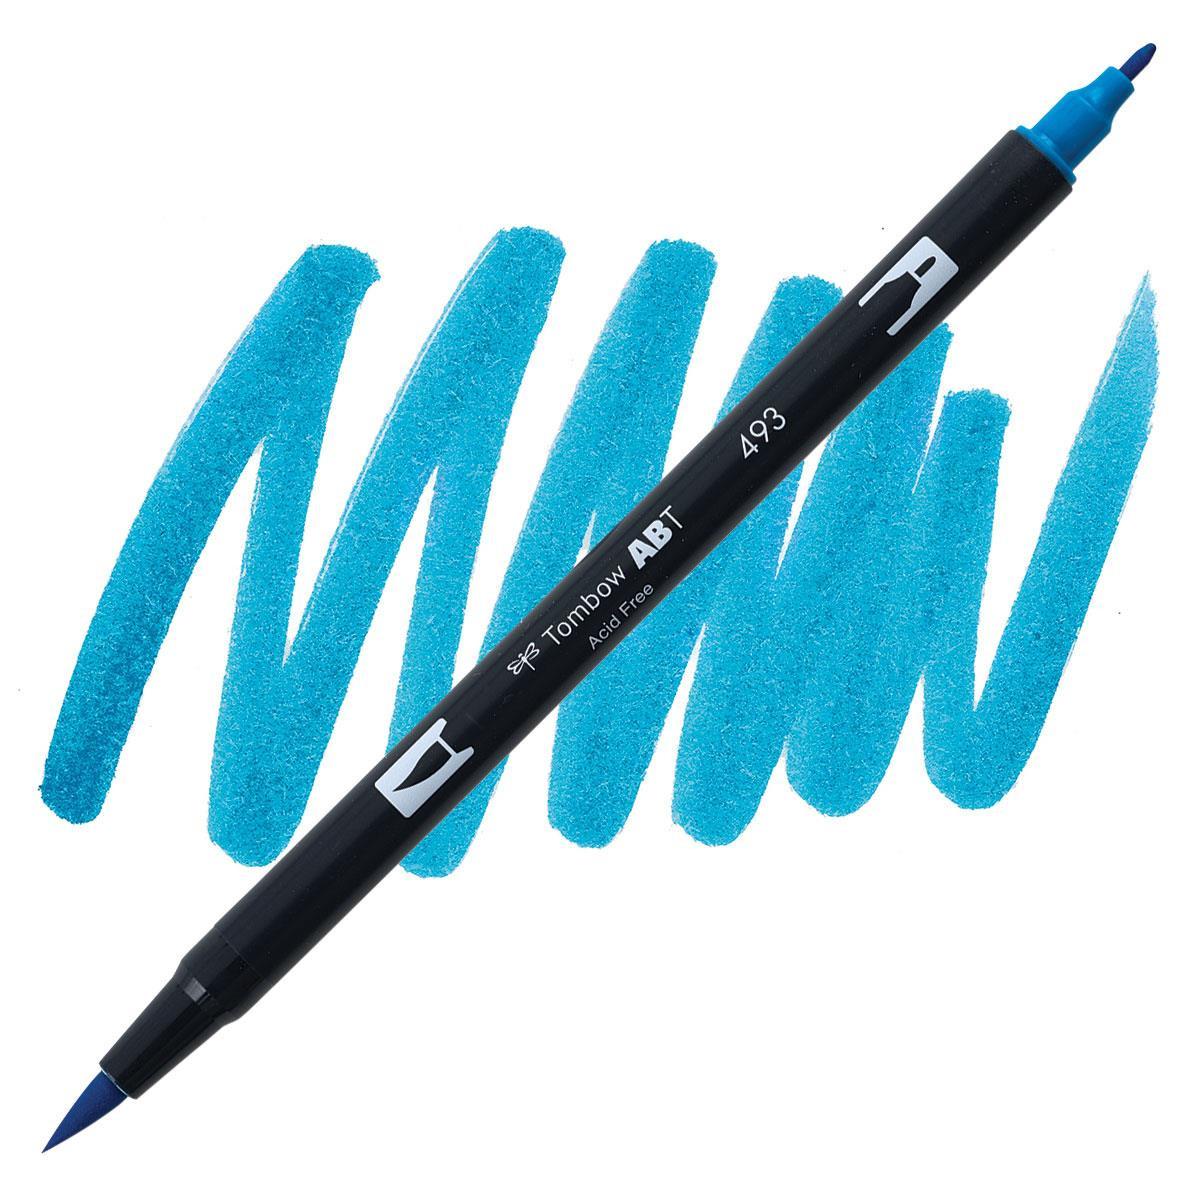 Reflex Blue (493), Tombow Dual Brush Pens - 085014565554